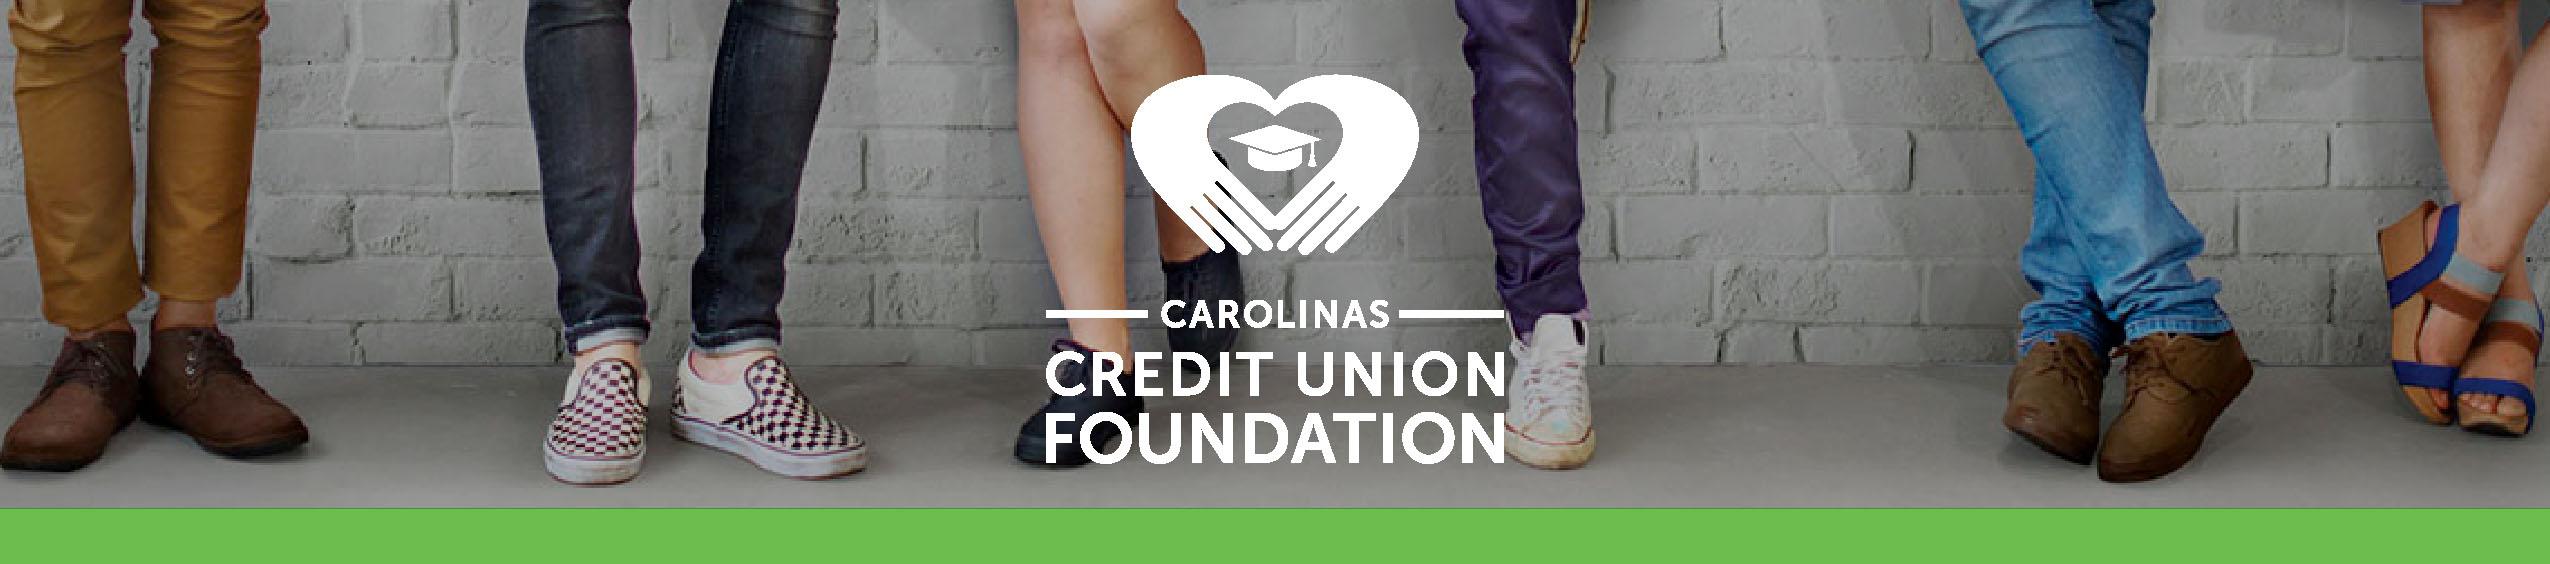 CCUF Scholarships Header